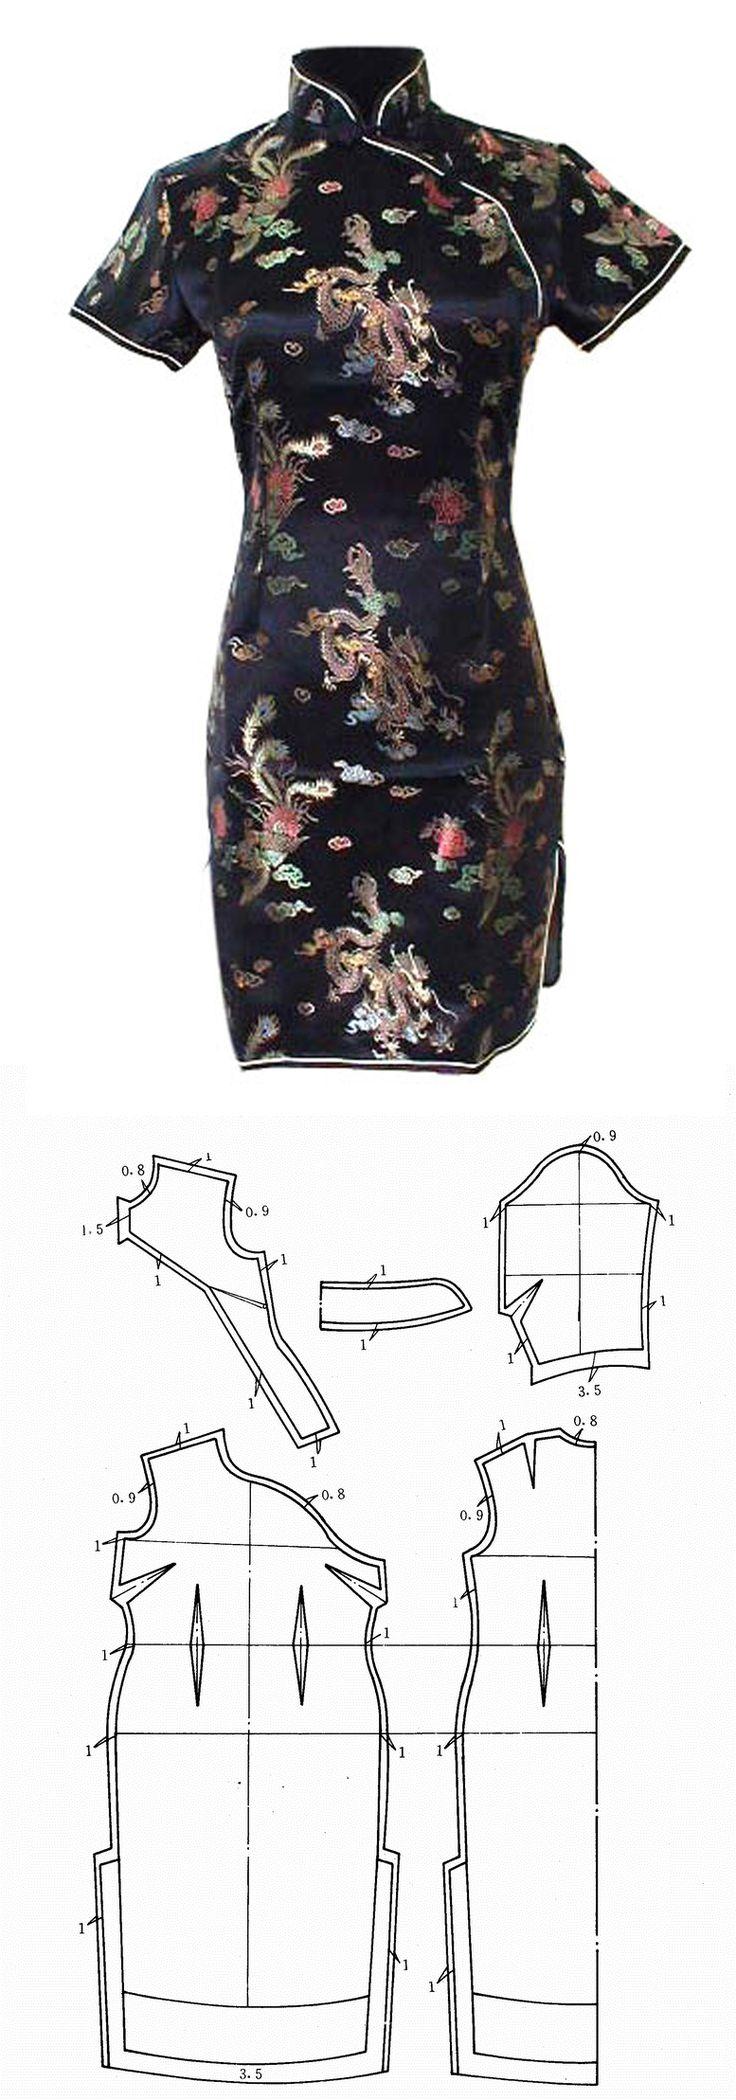 qipao - Tradicional chinese dress pattern